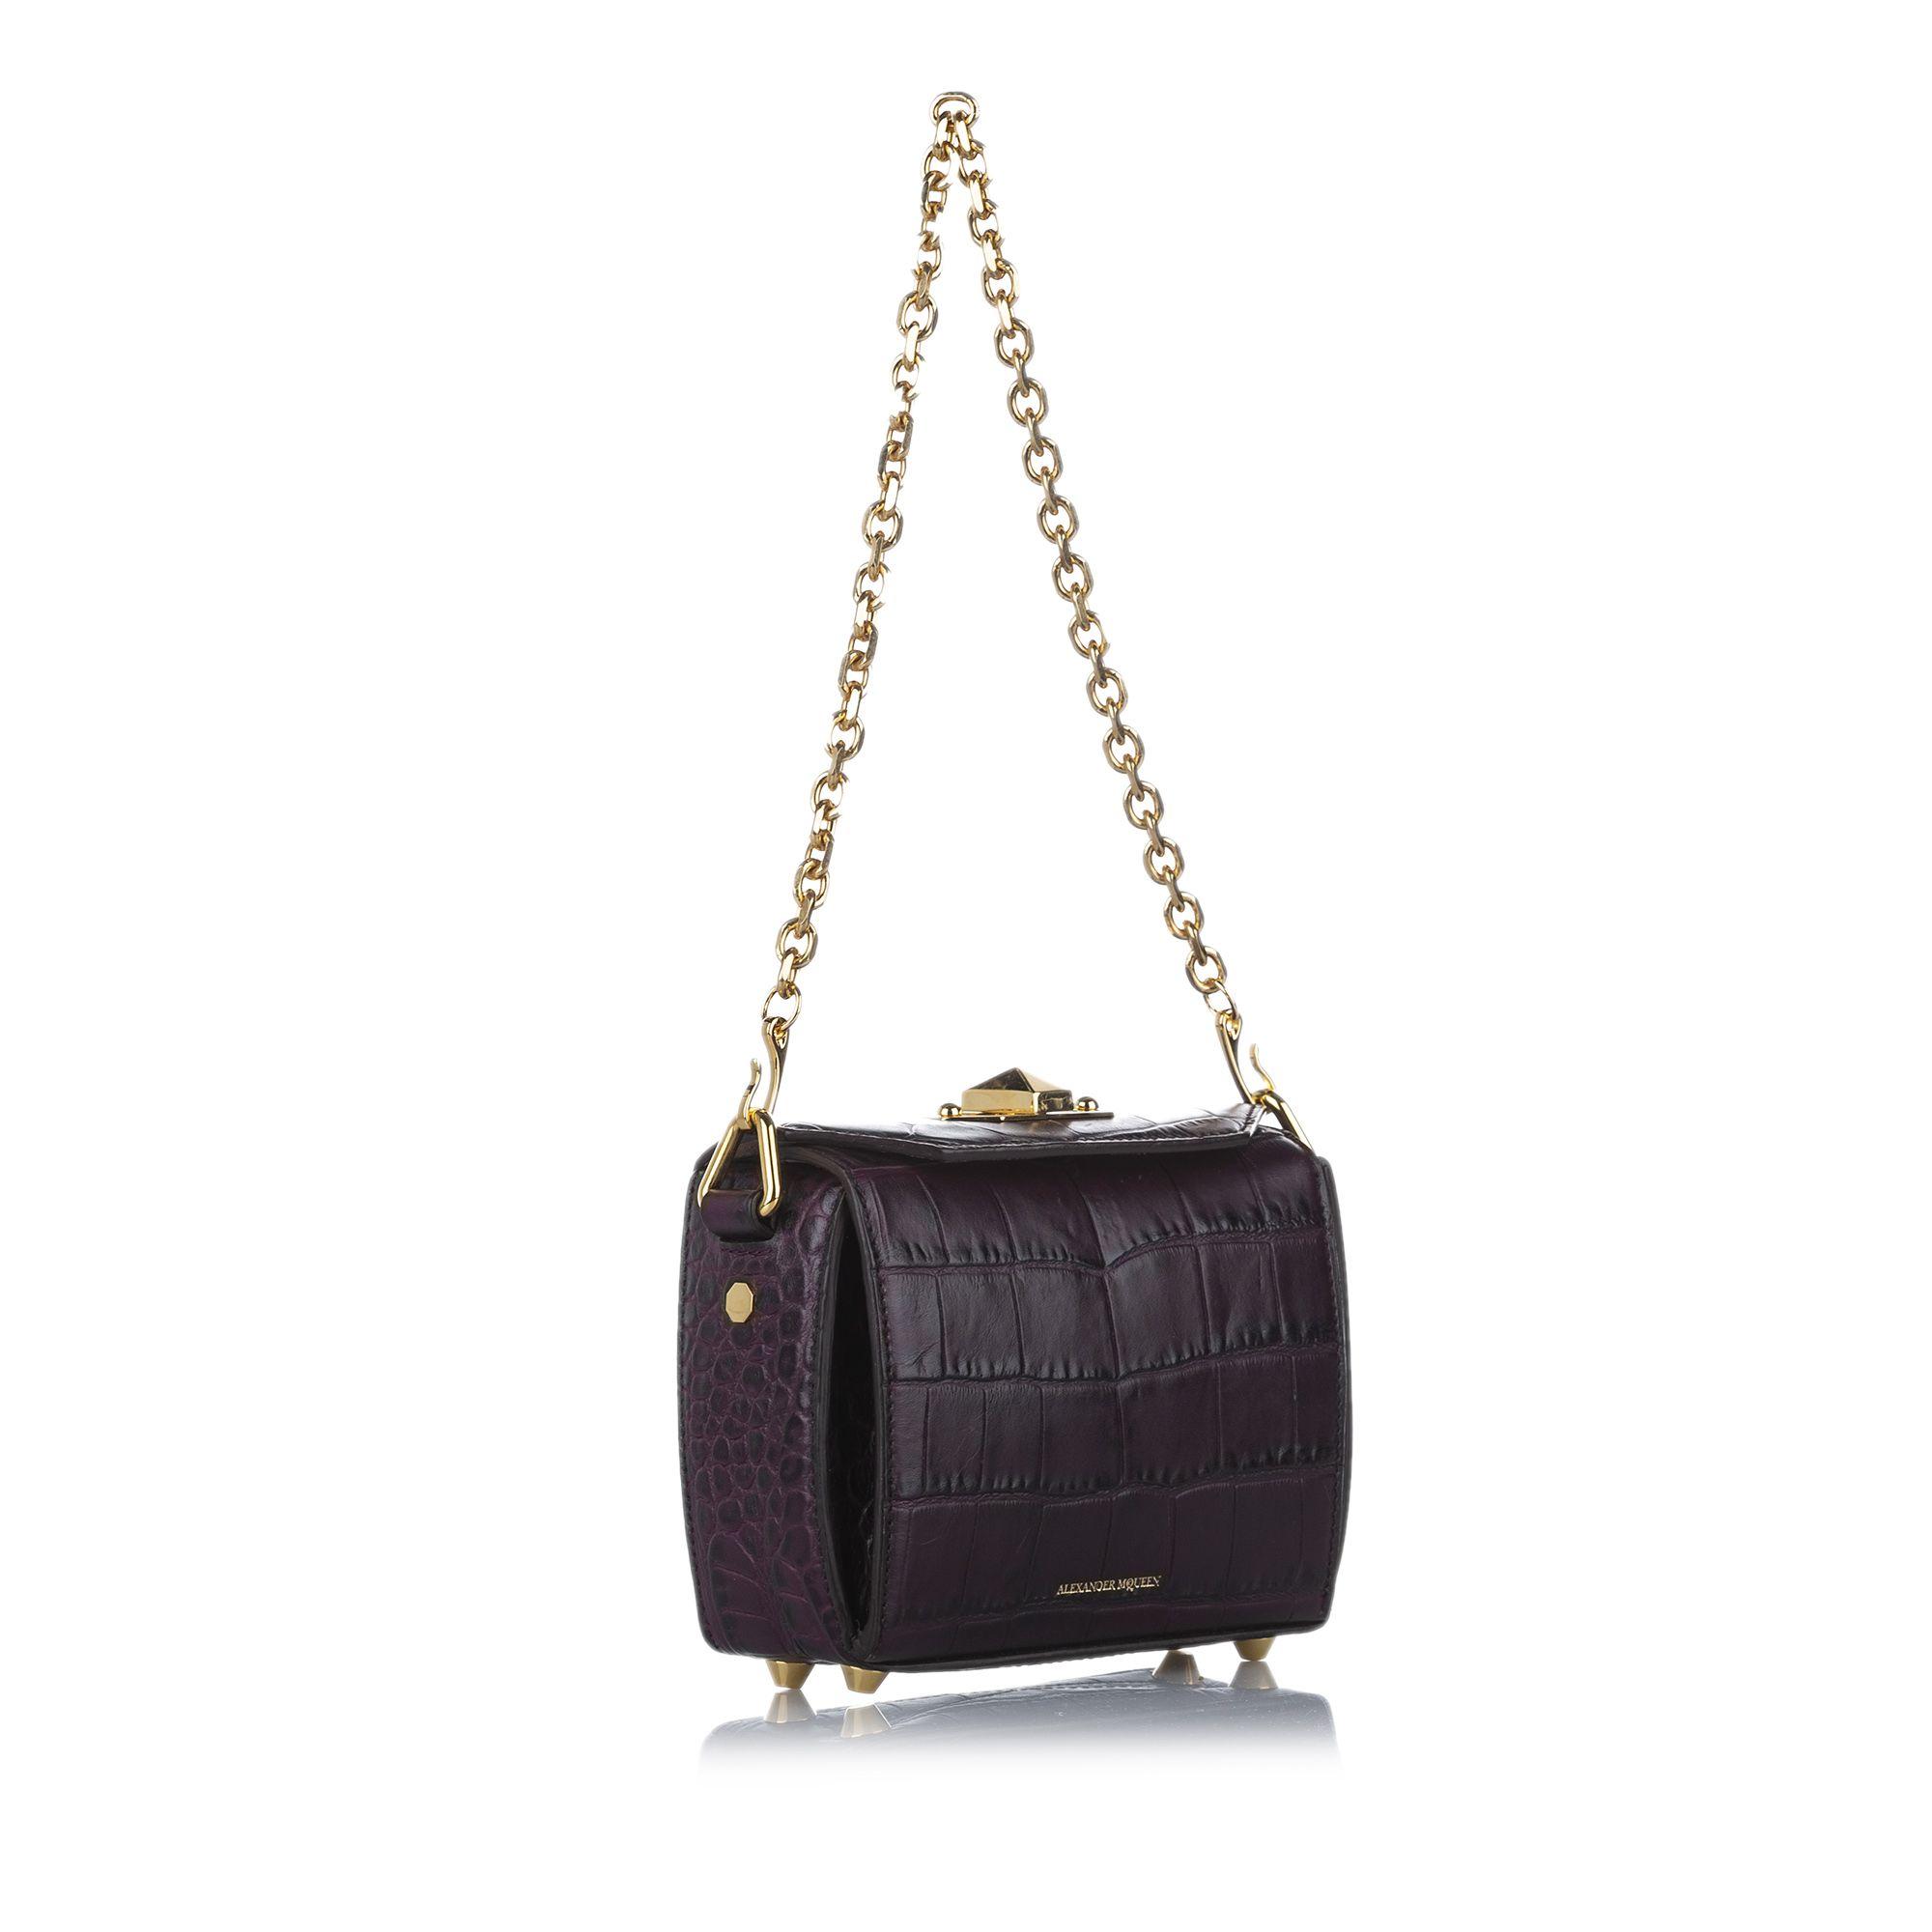 Vintage Alexander McQueen Box 16 Embossed Leather Crossbody Bag Purple